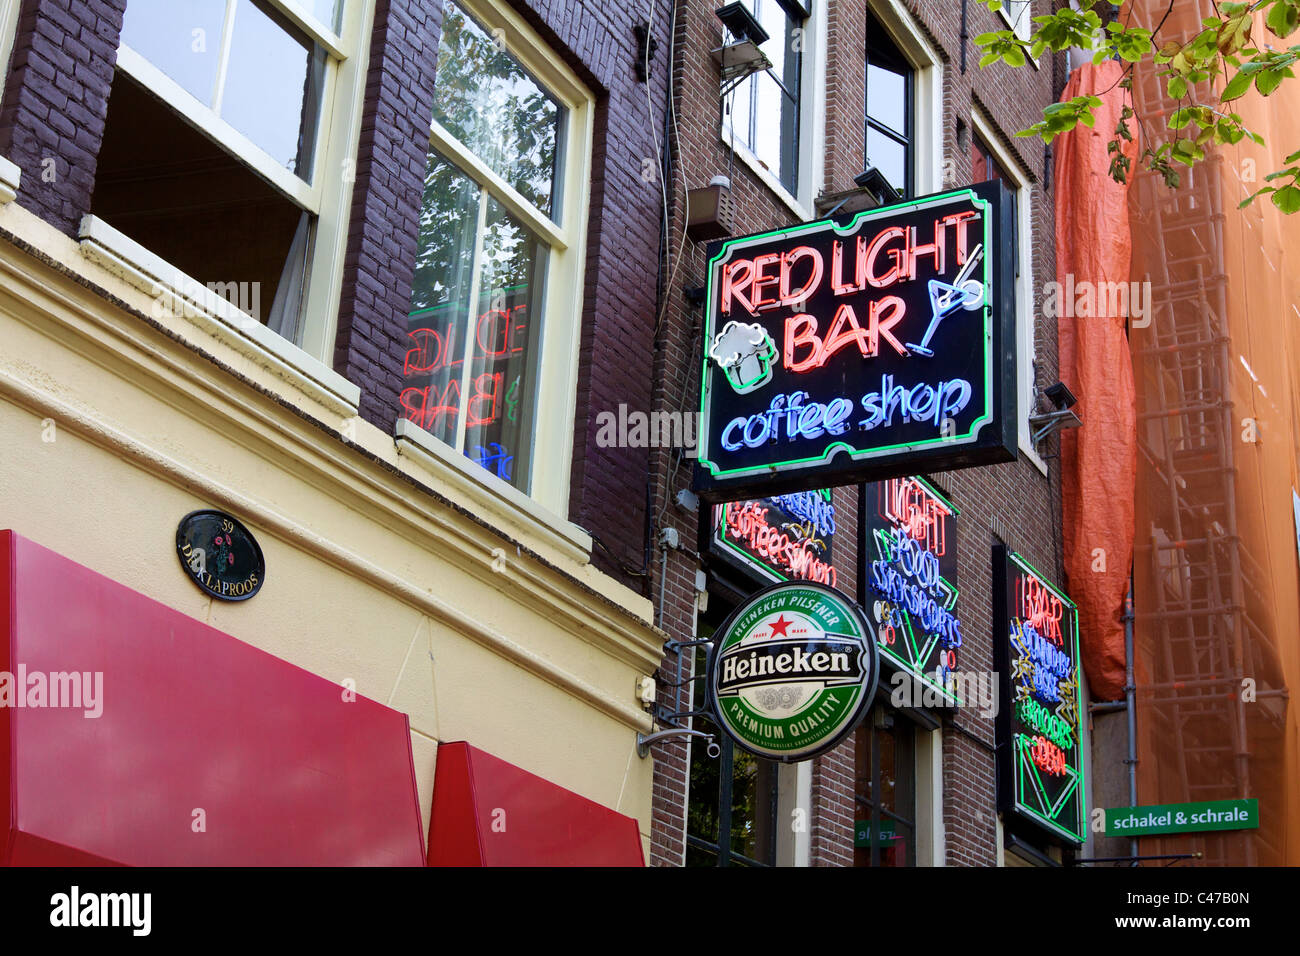 Red light bar amsterdam stock photo 37041669 alamy red light bar amsterdam aloadofball Image collections